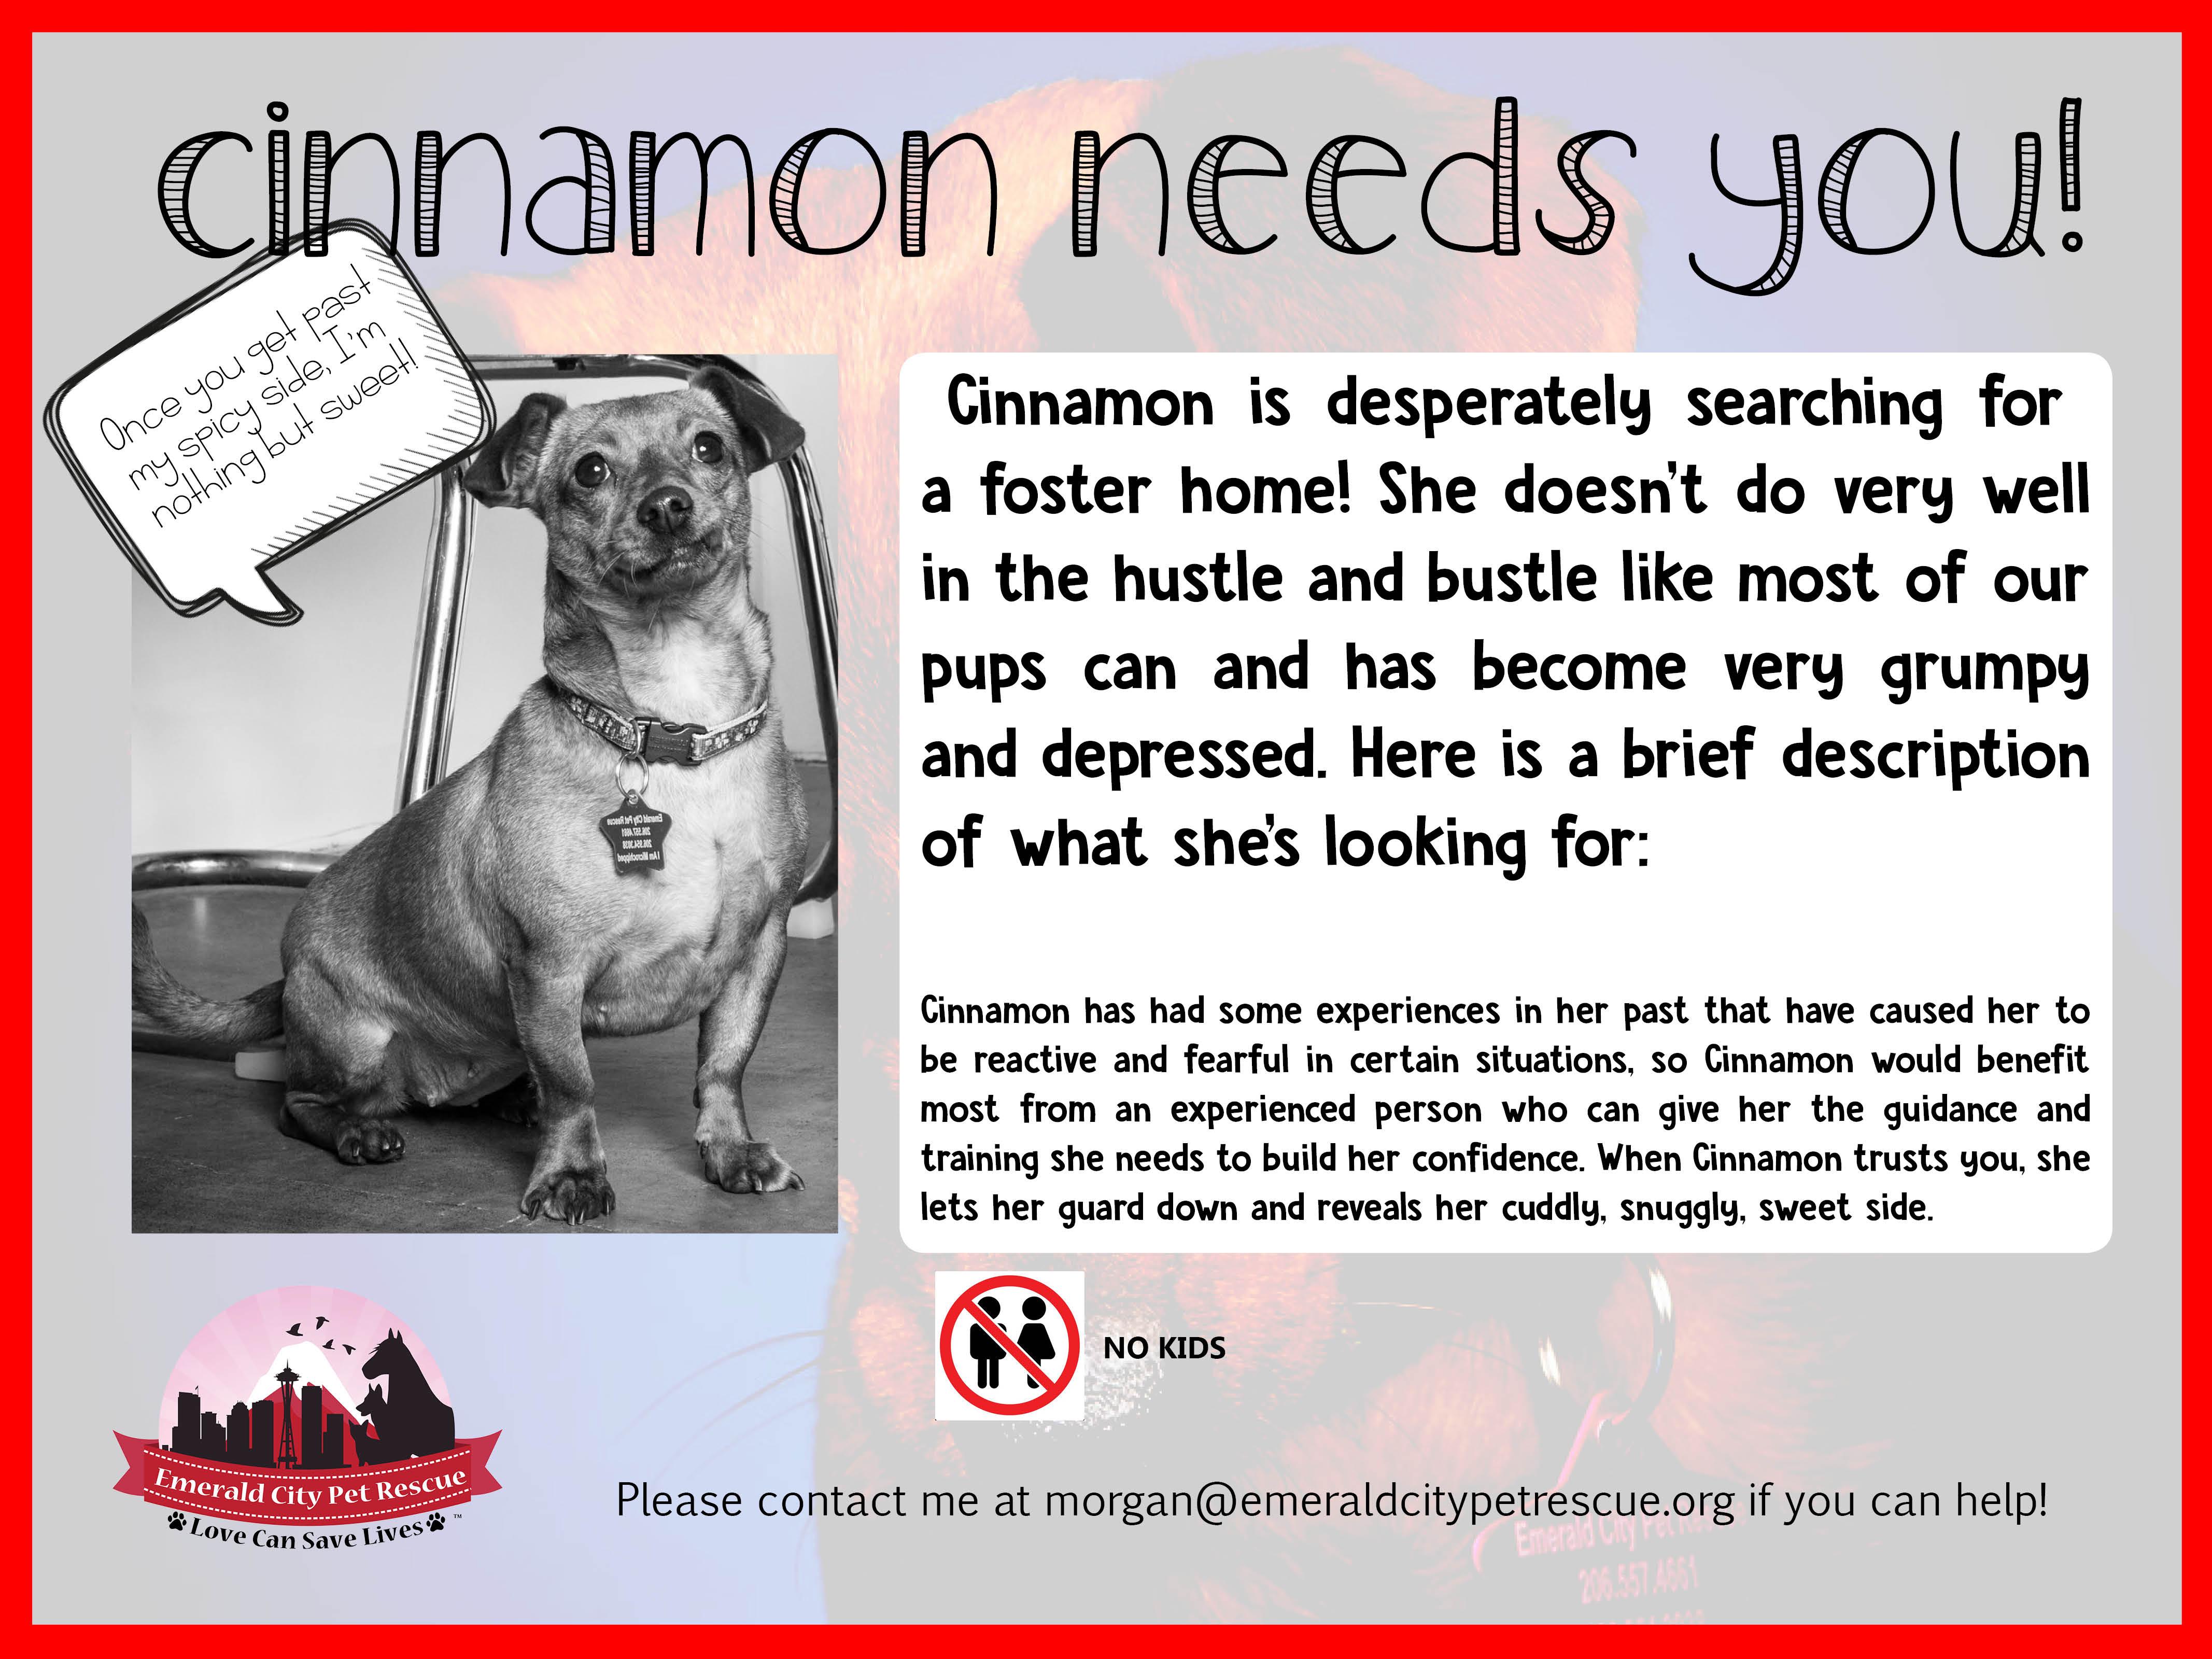 can i give my dog cinnamon